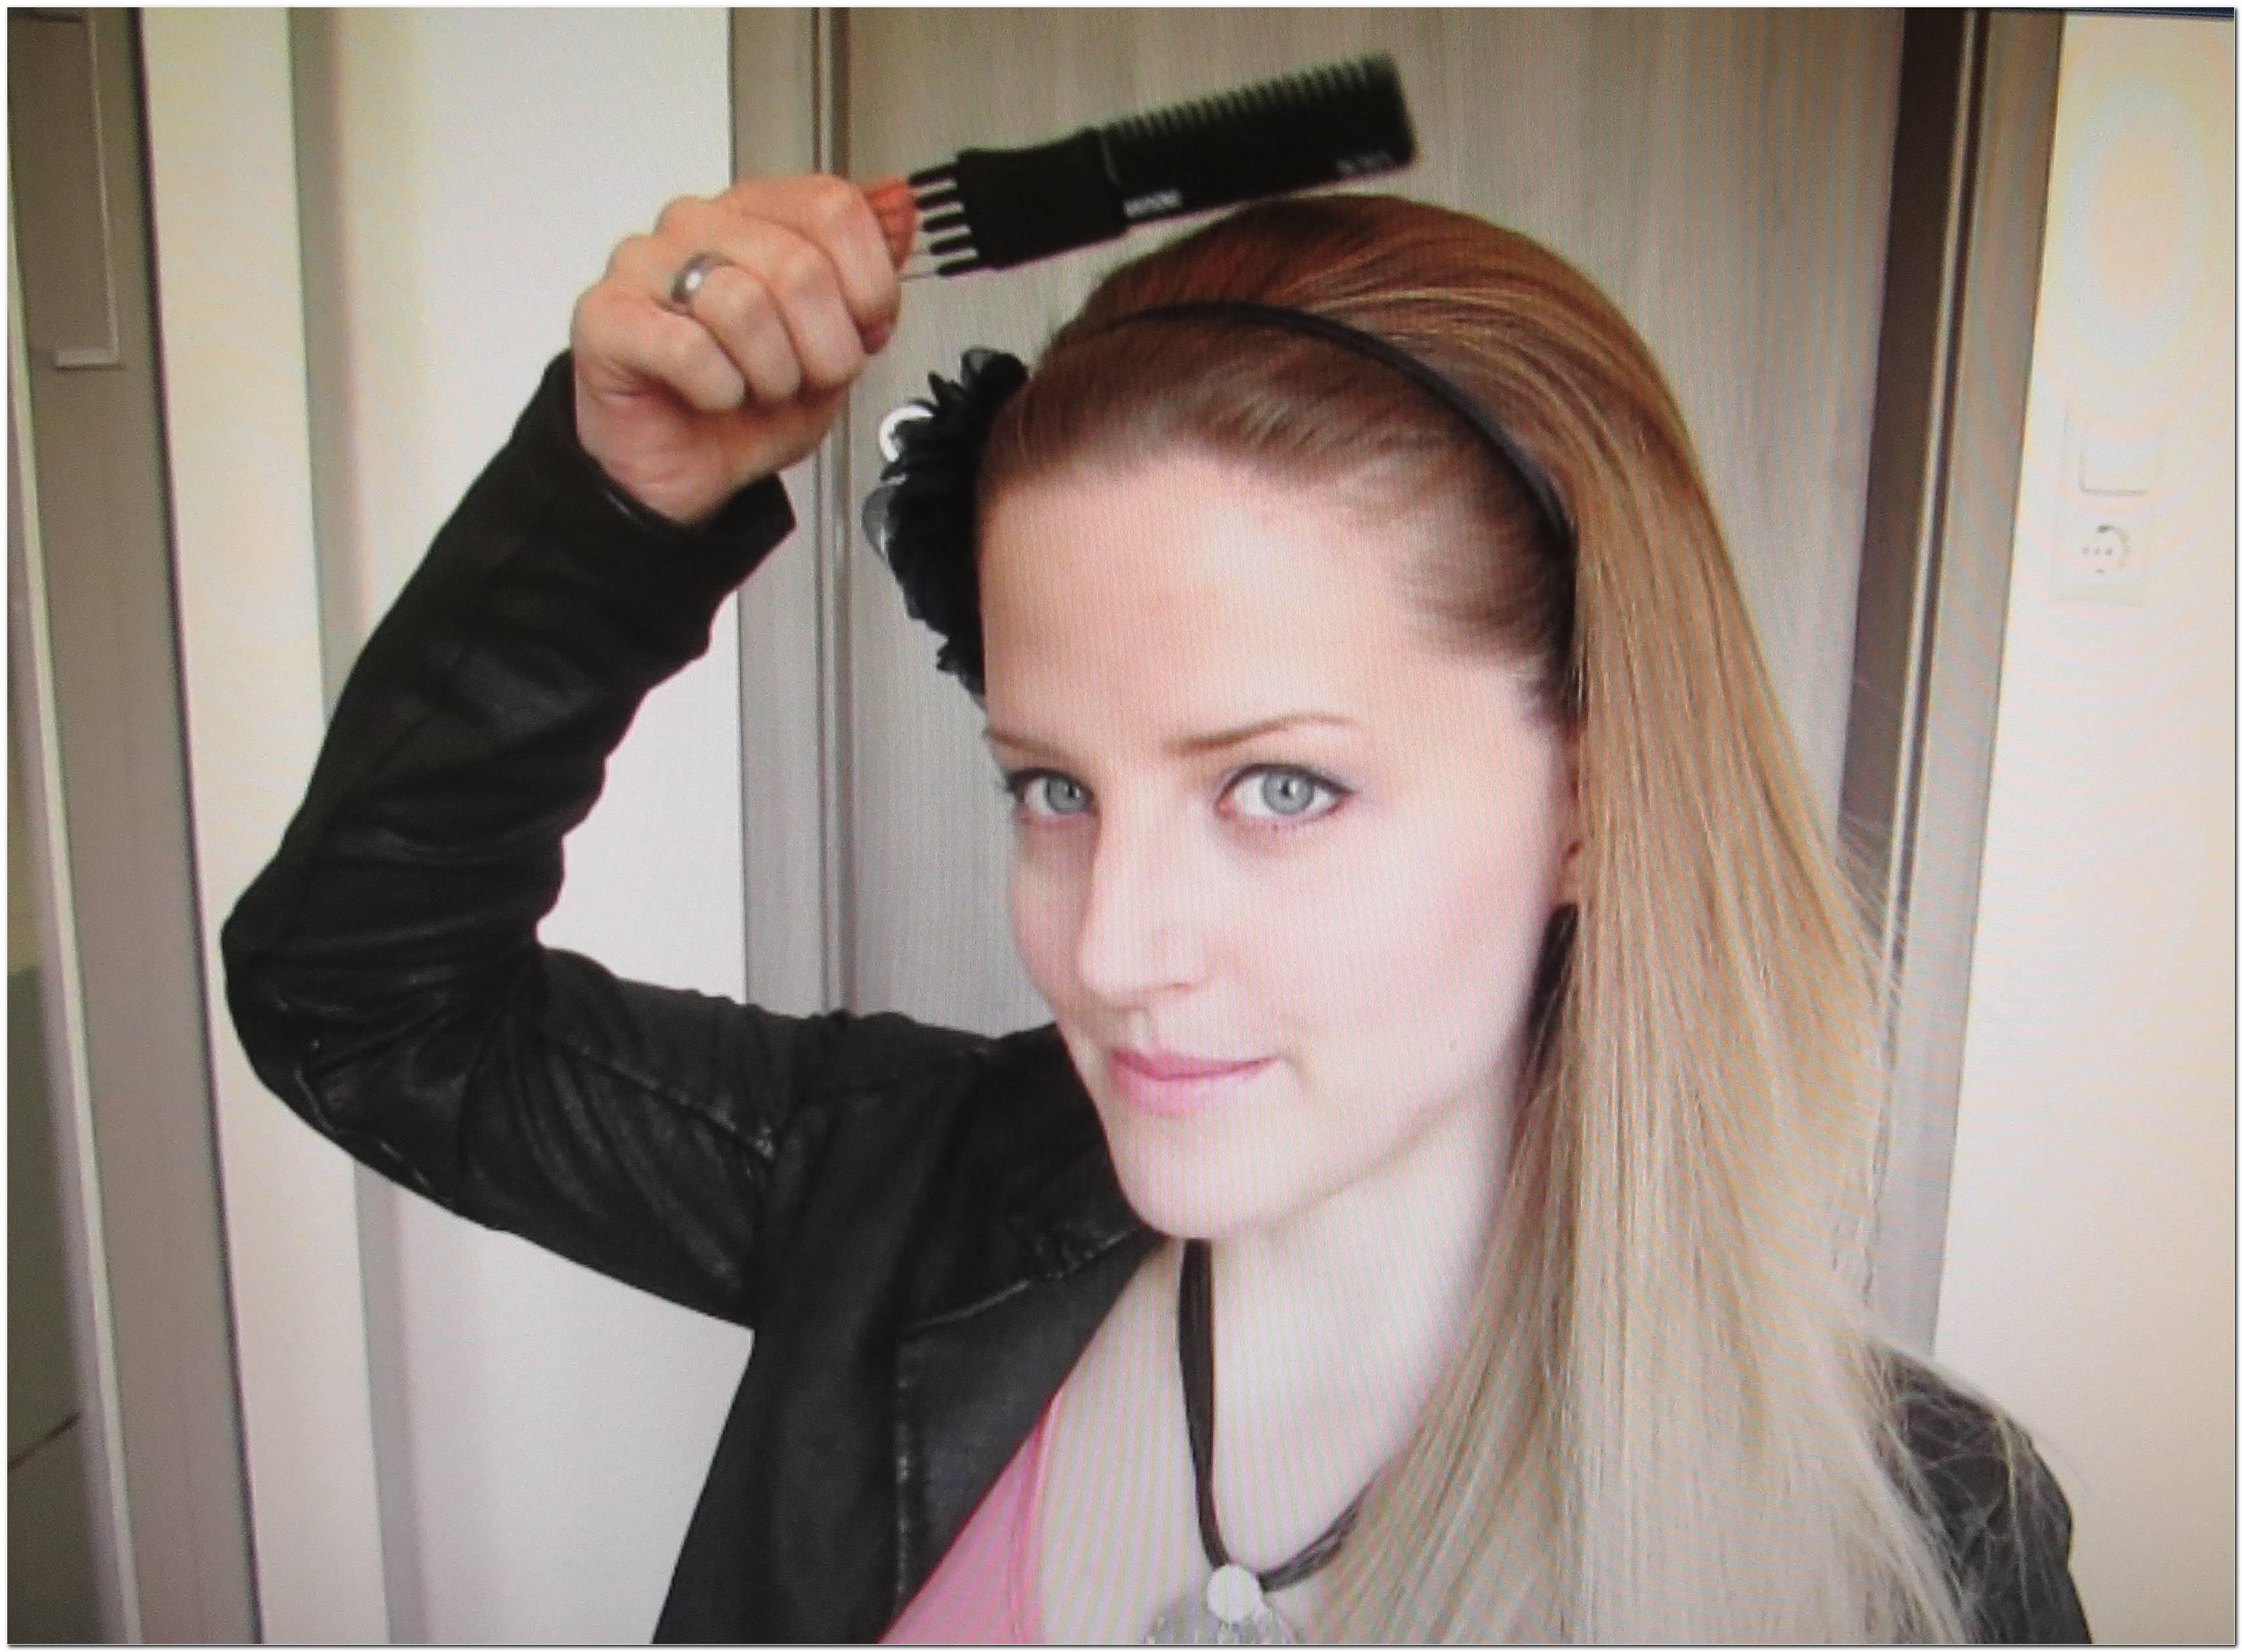 Frisuren Mit Haarreif